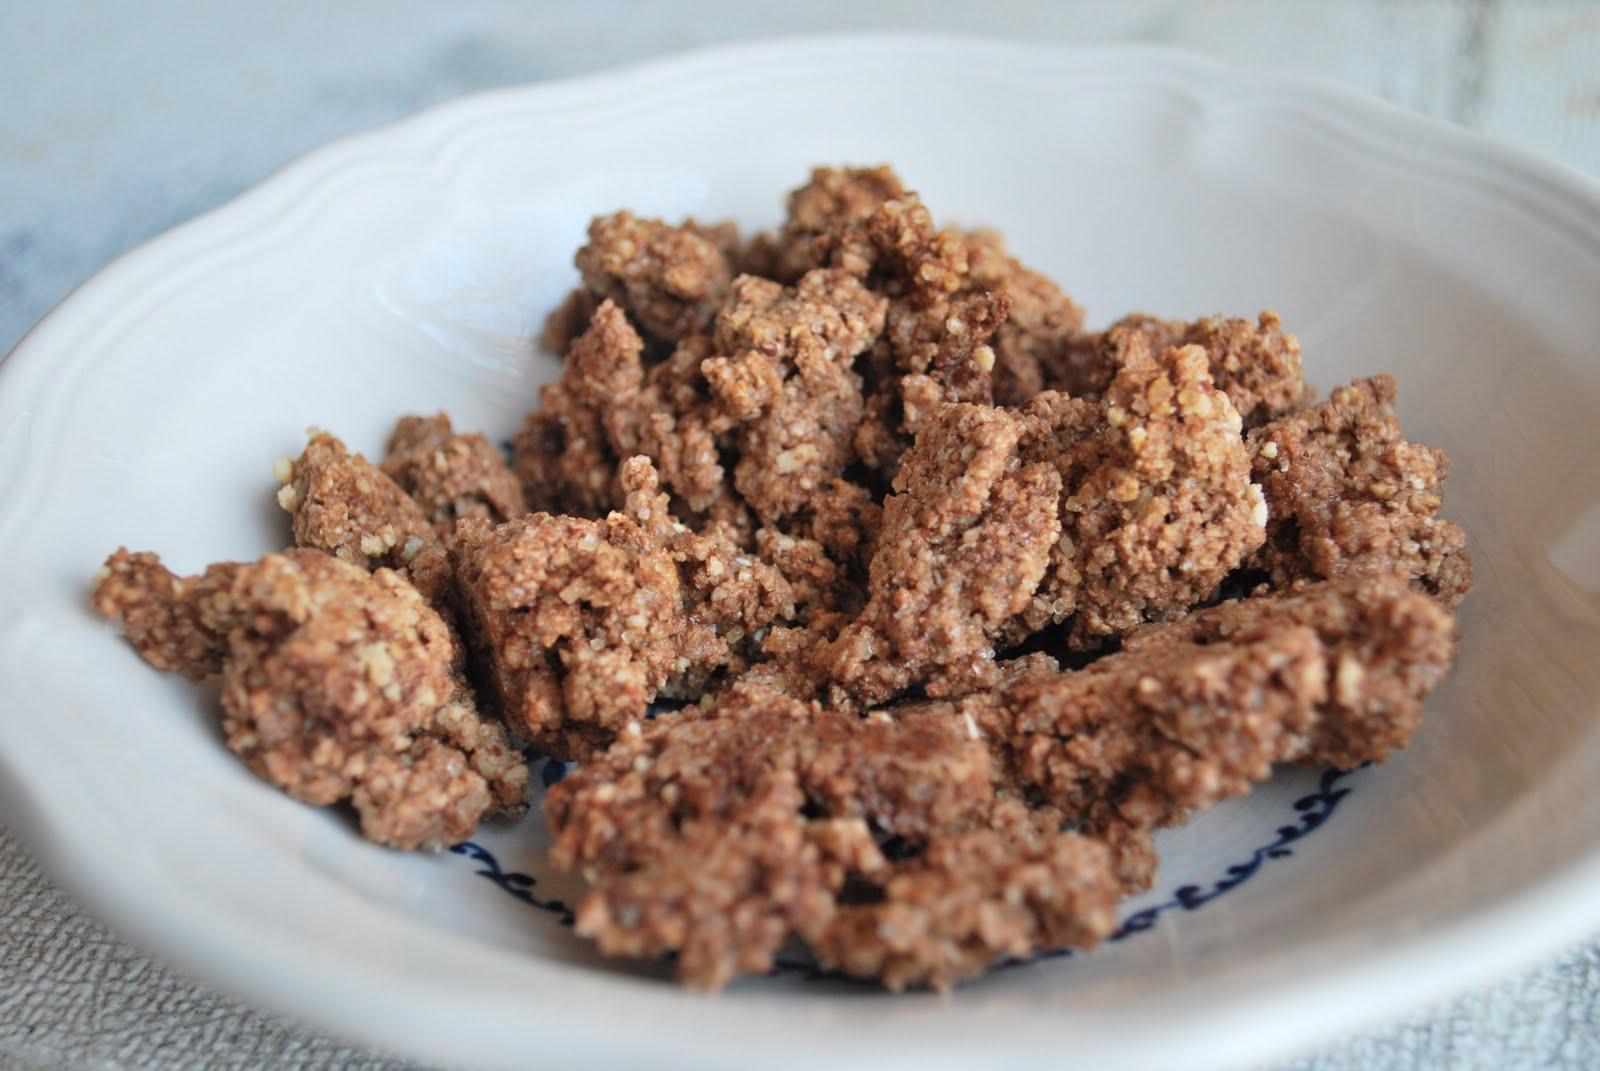 Vegan Crunk: Cookie Crumble